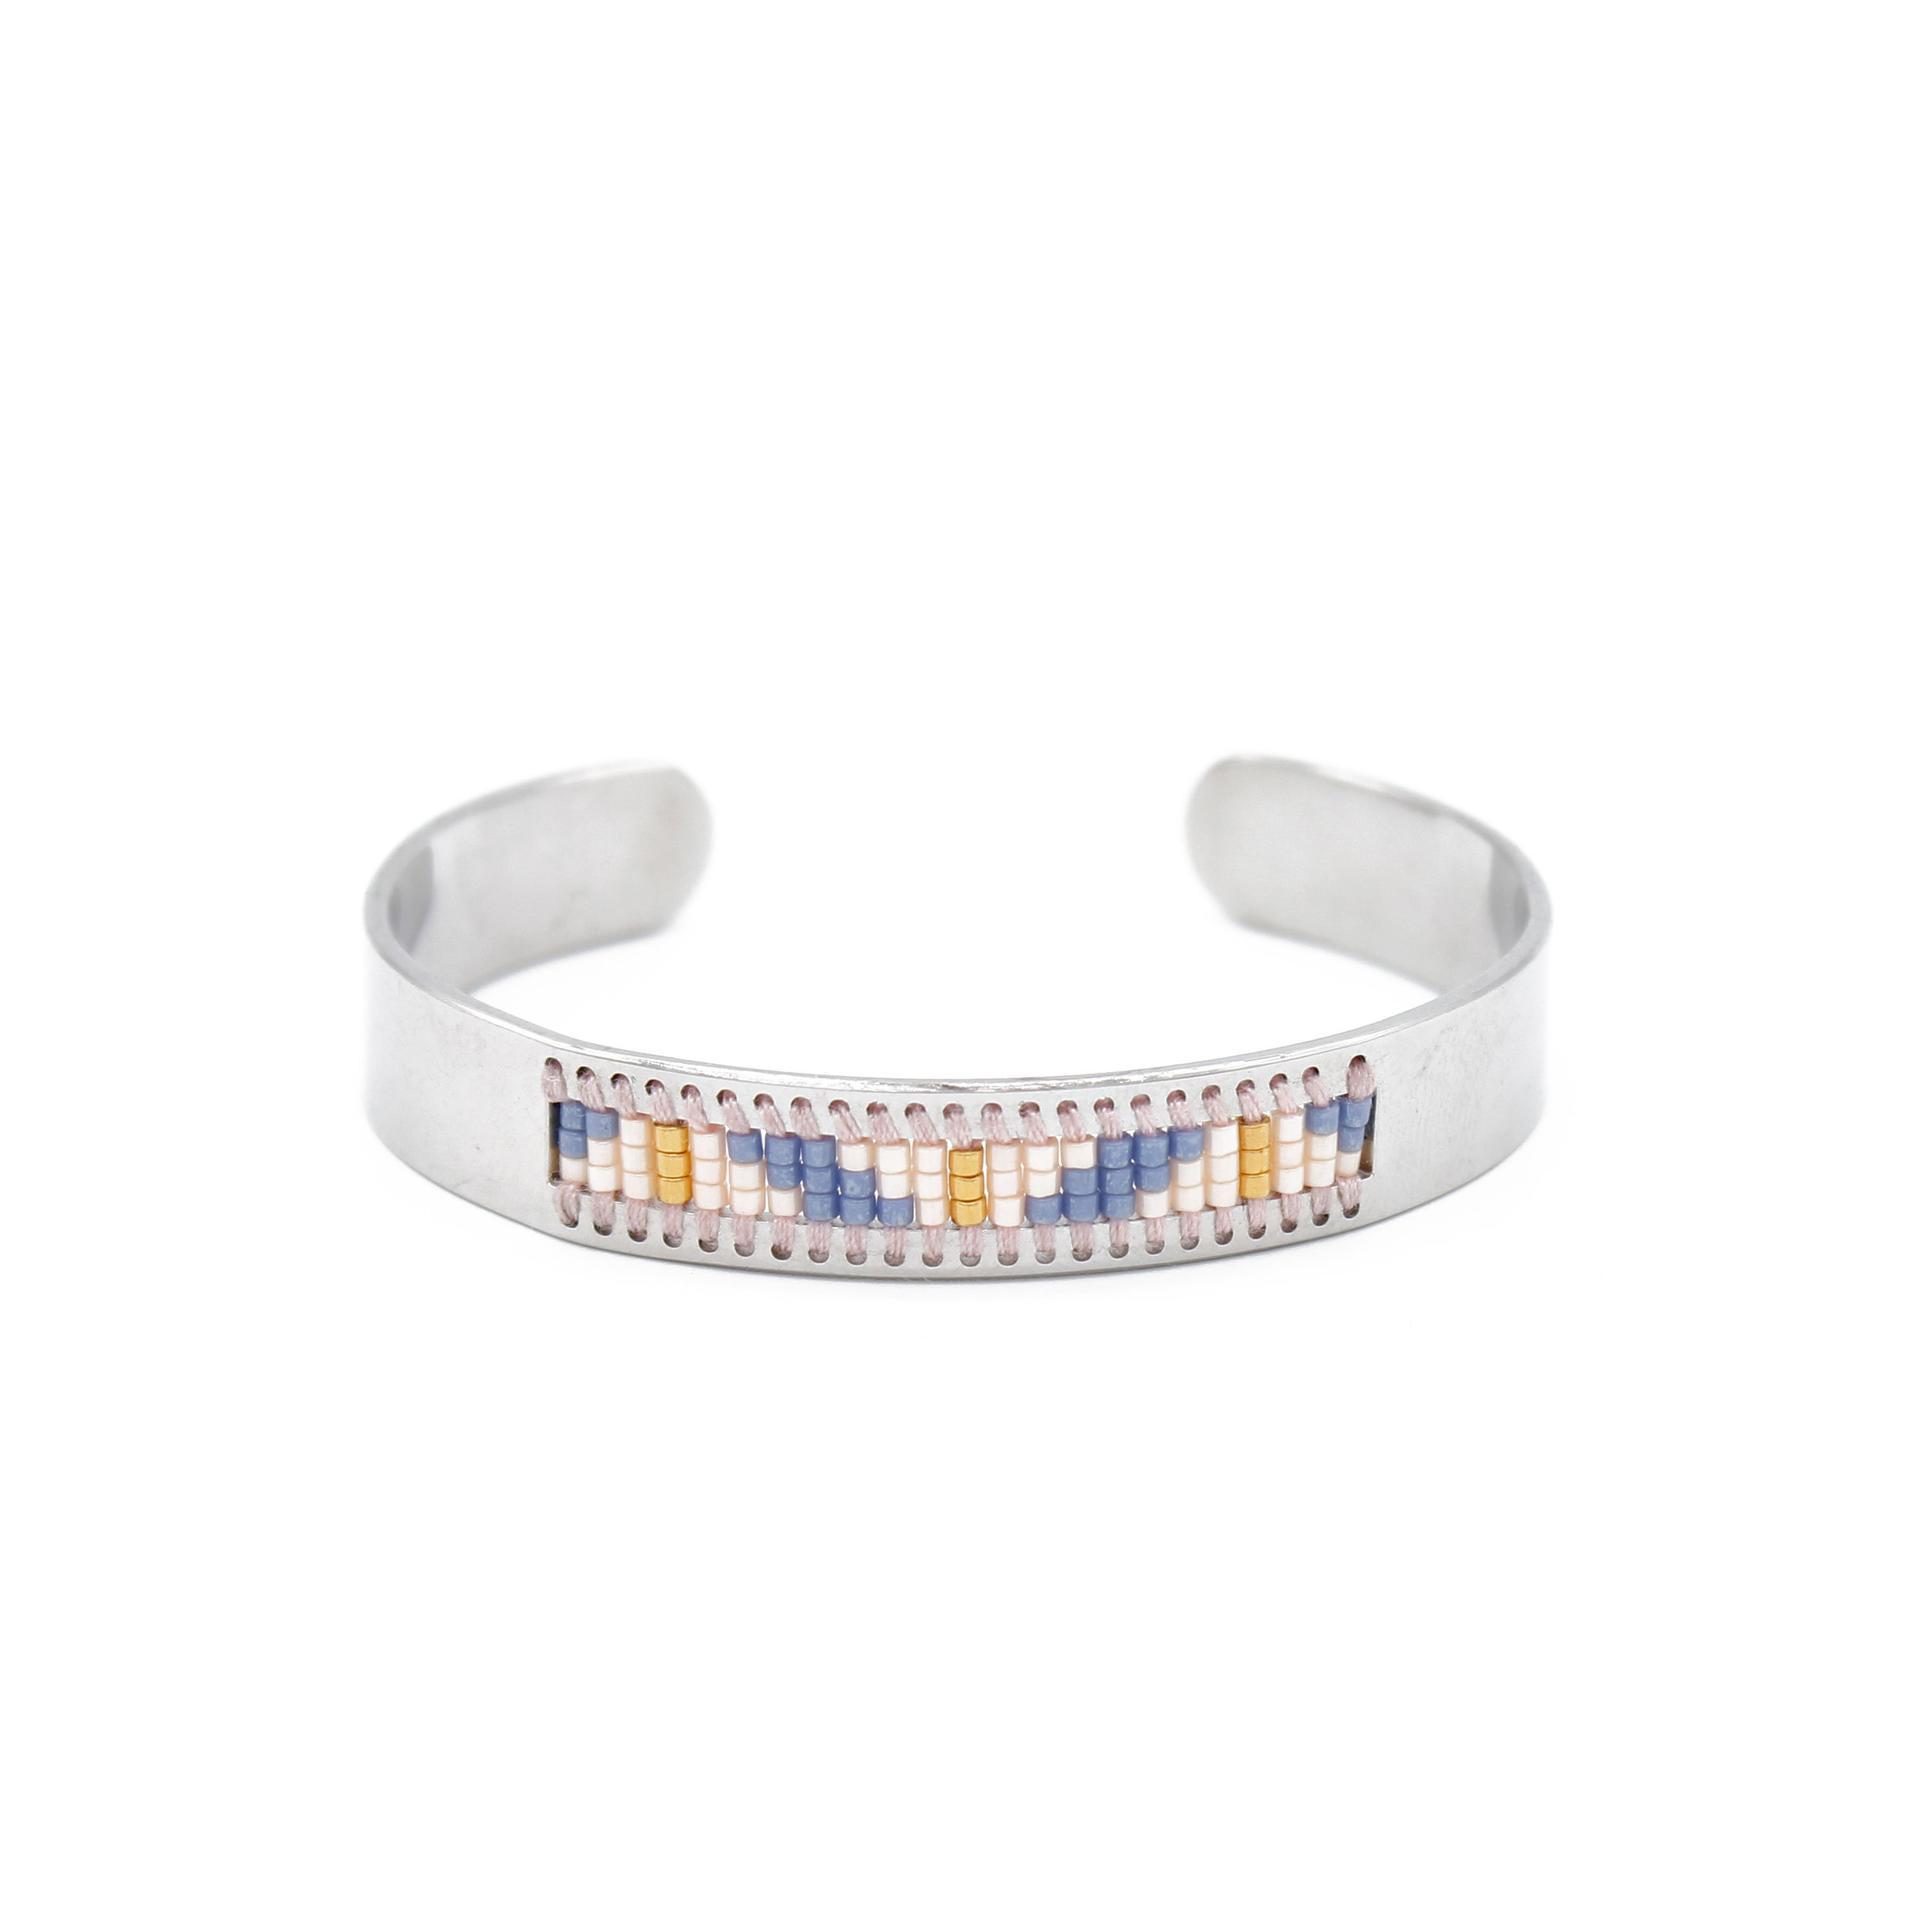 stainless steel bangle bracelets miyuki steel seed handmade Bulk Buy